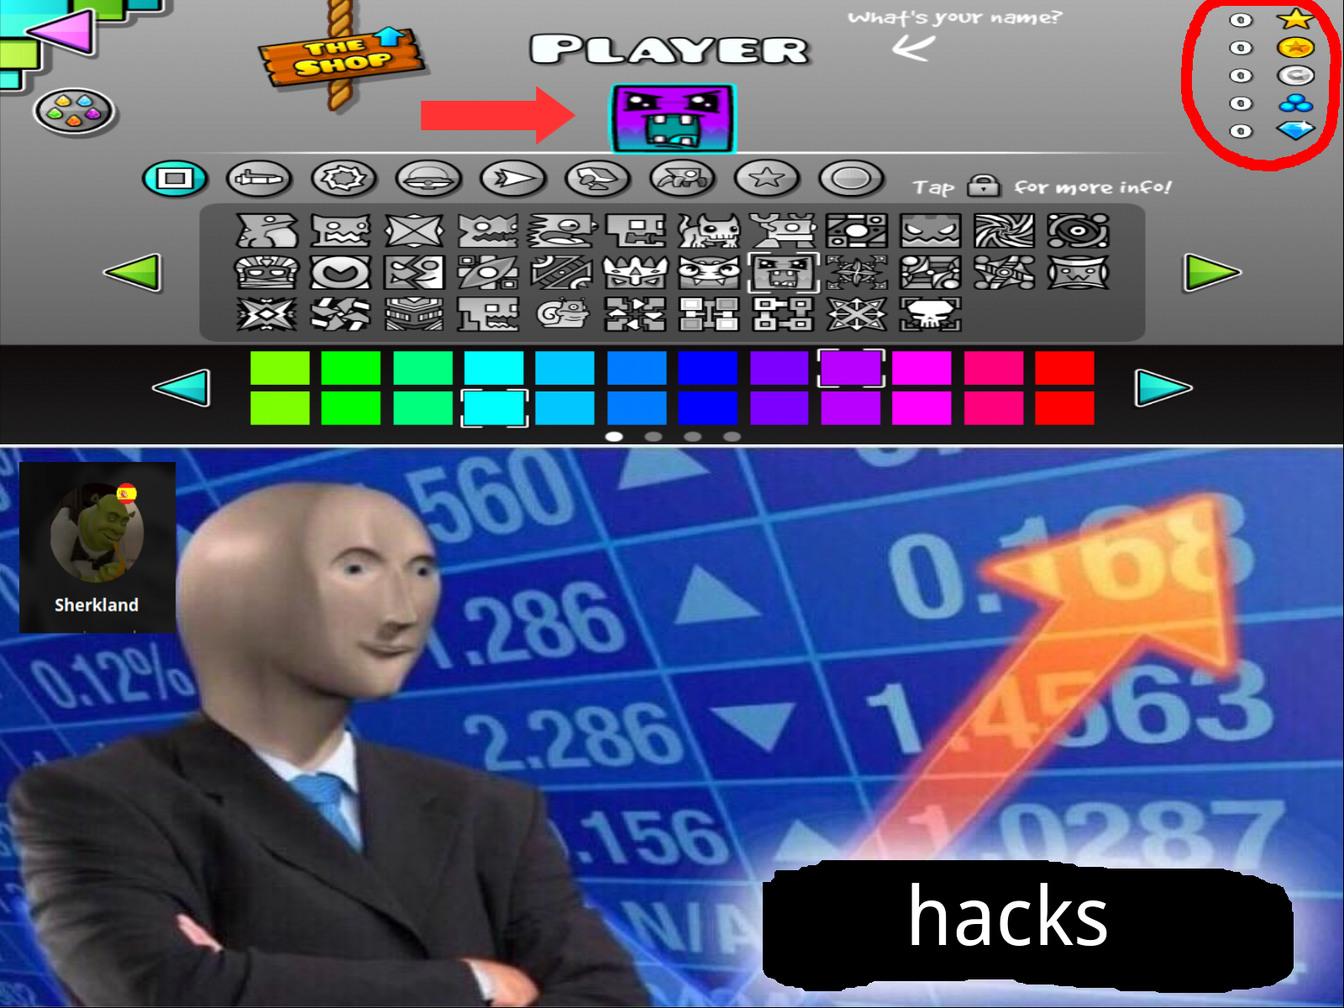 13 - meme